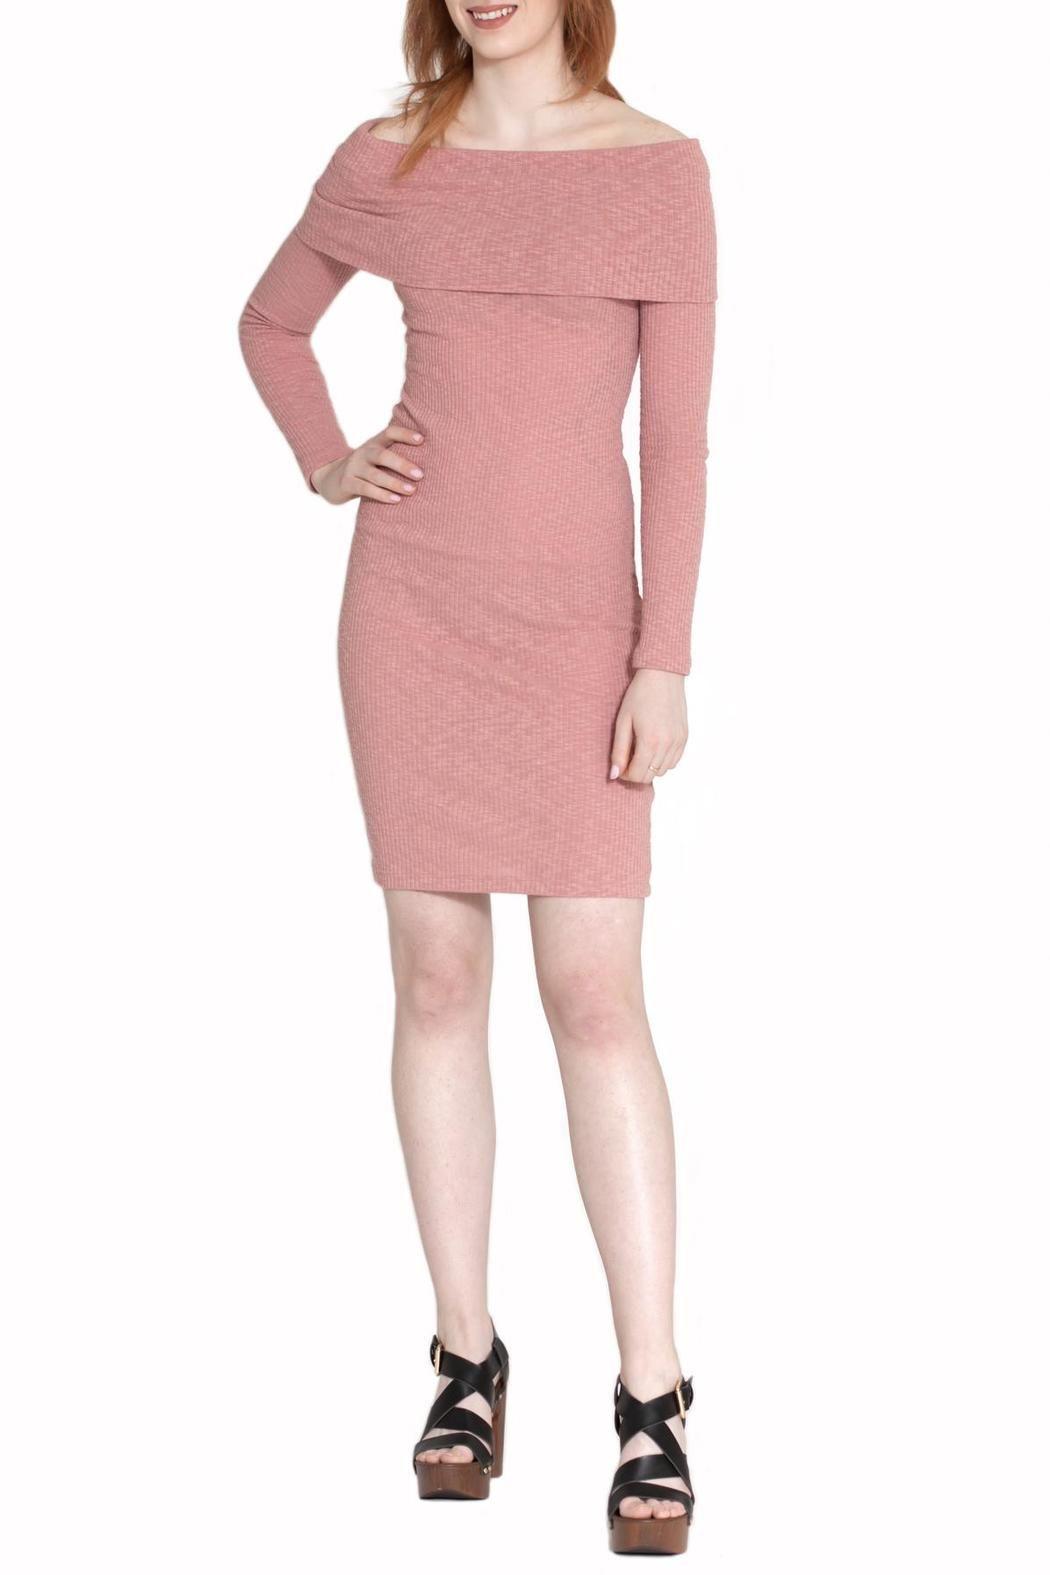 Cherish Off Shoulder Bodycon Dress   Dresses, Bodycon dress